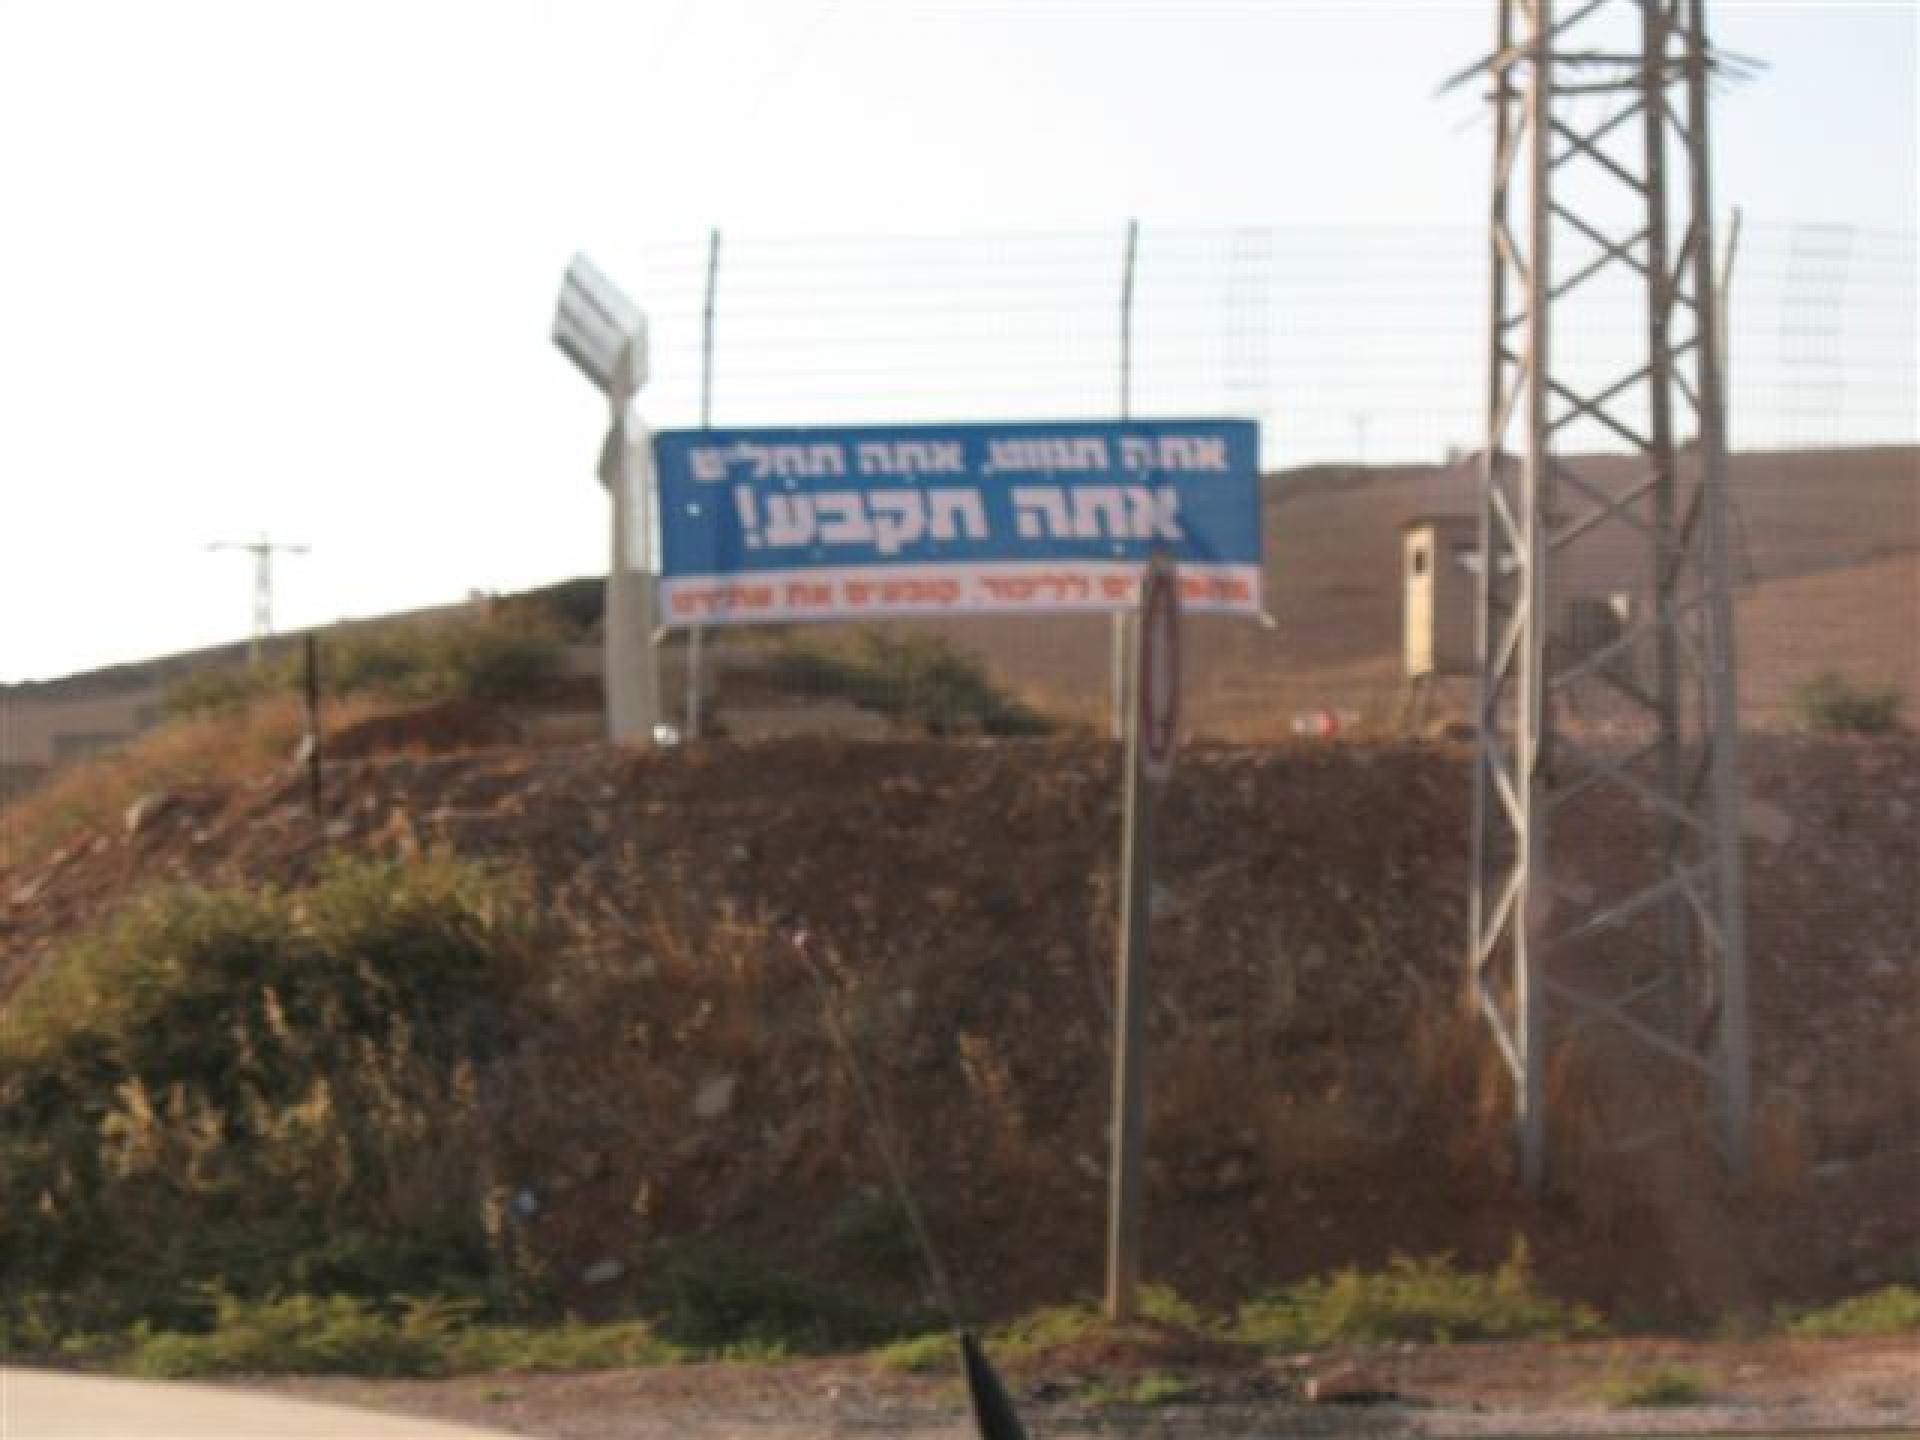 Hamra /Beqaot 16.09.10